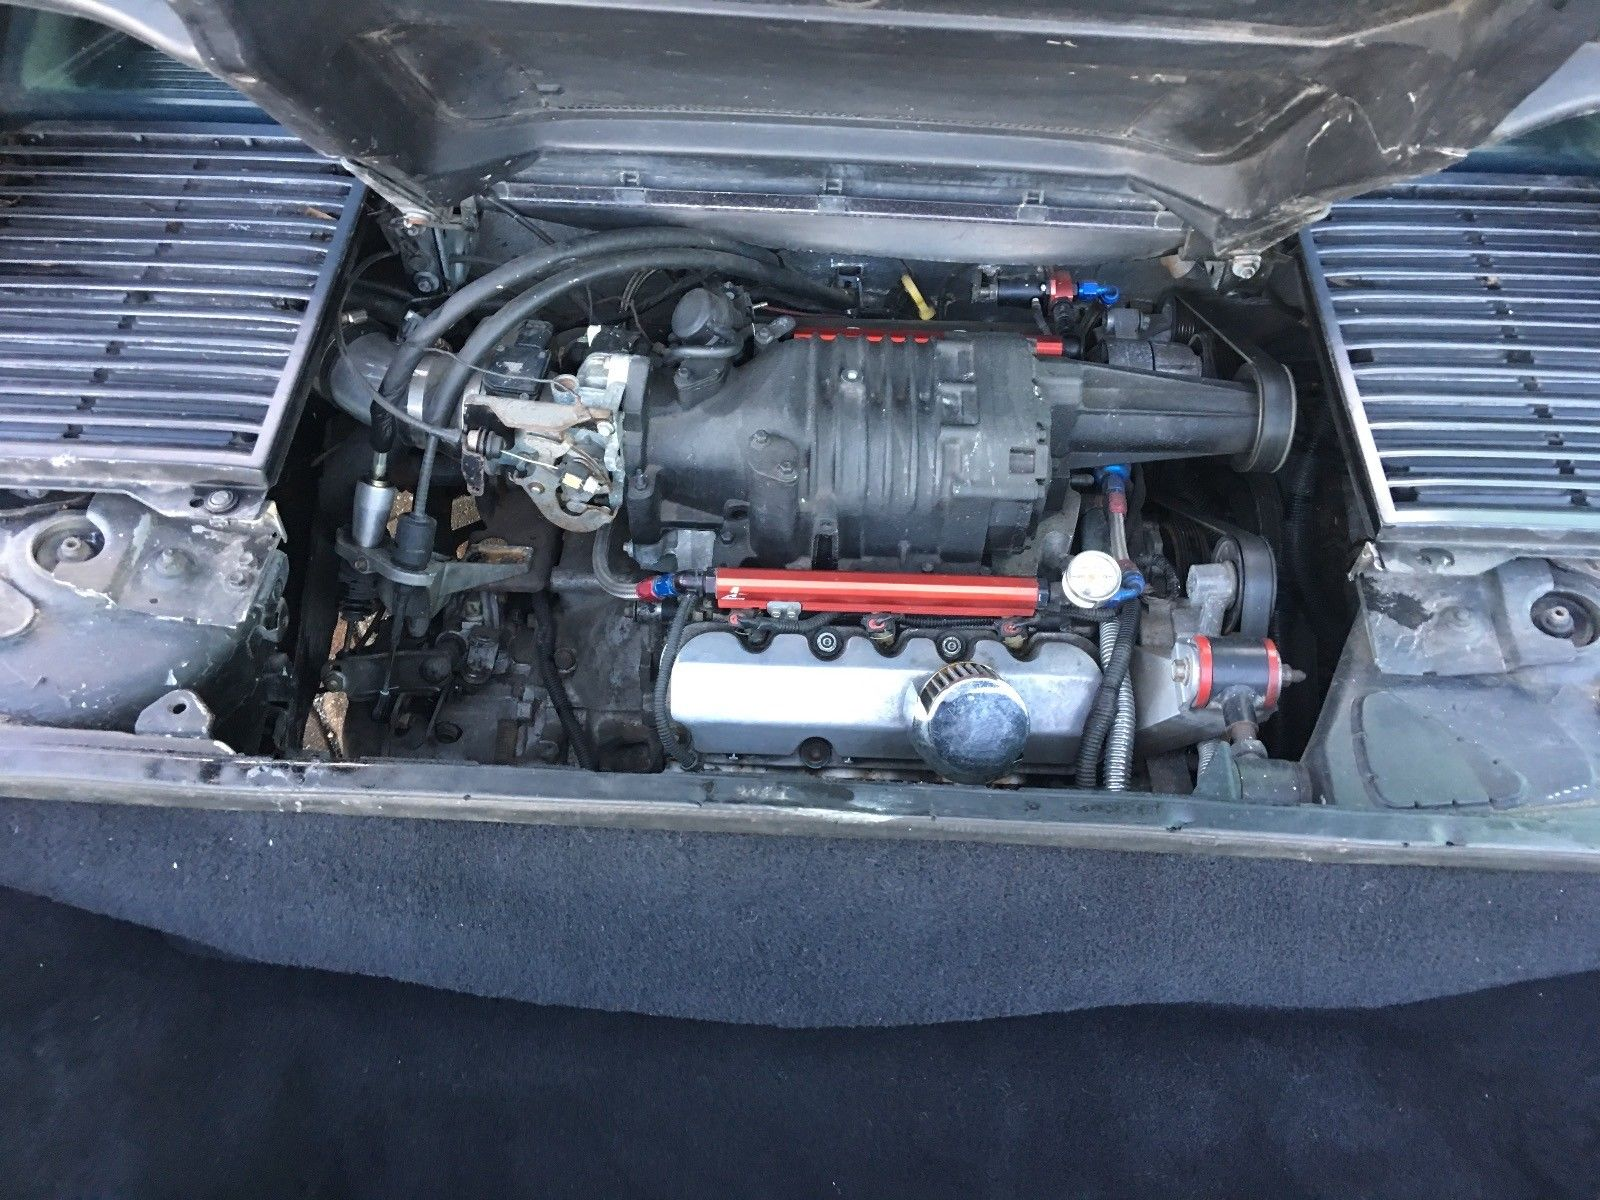 1986 Pontiac Fiero engine buick 3800 supercharger